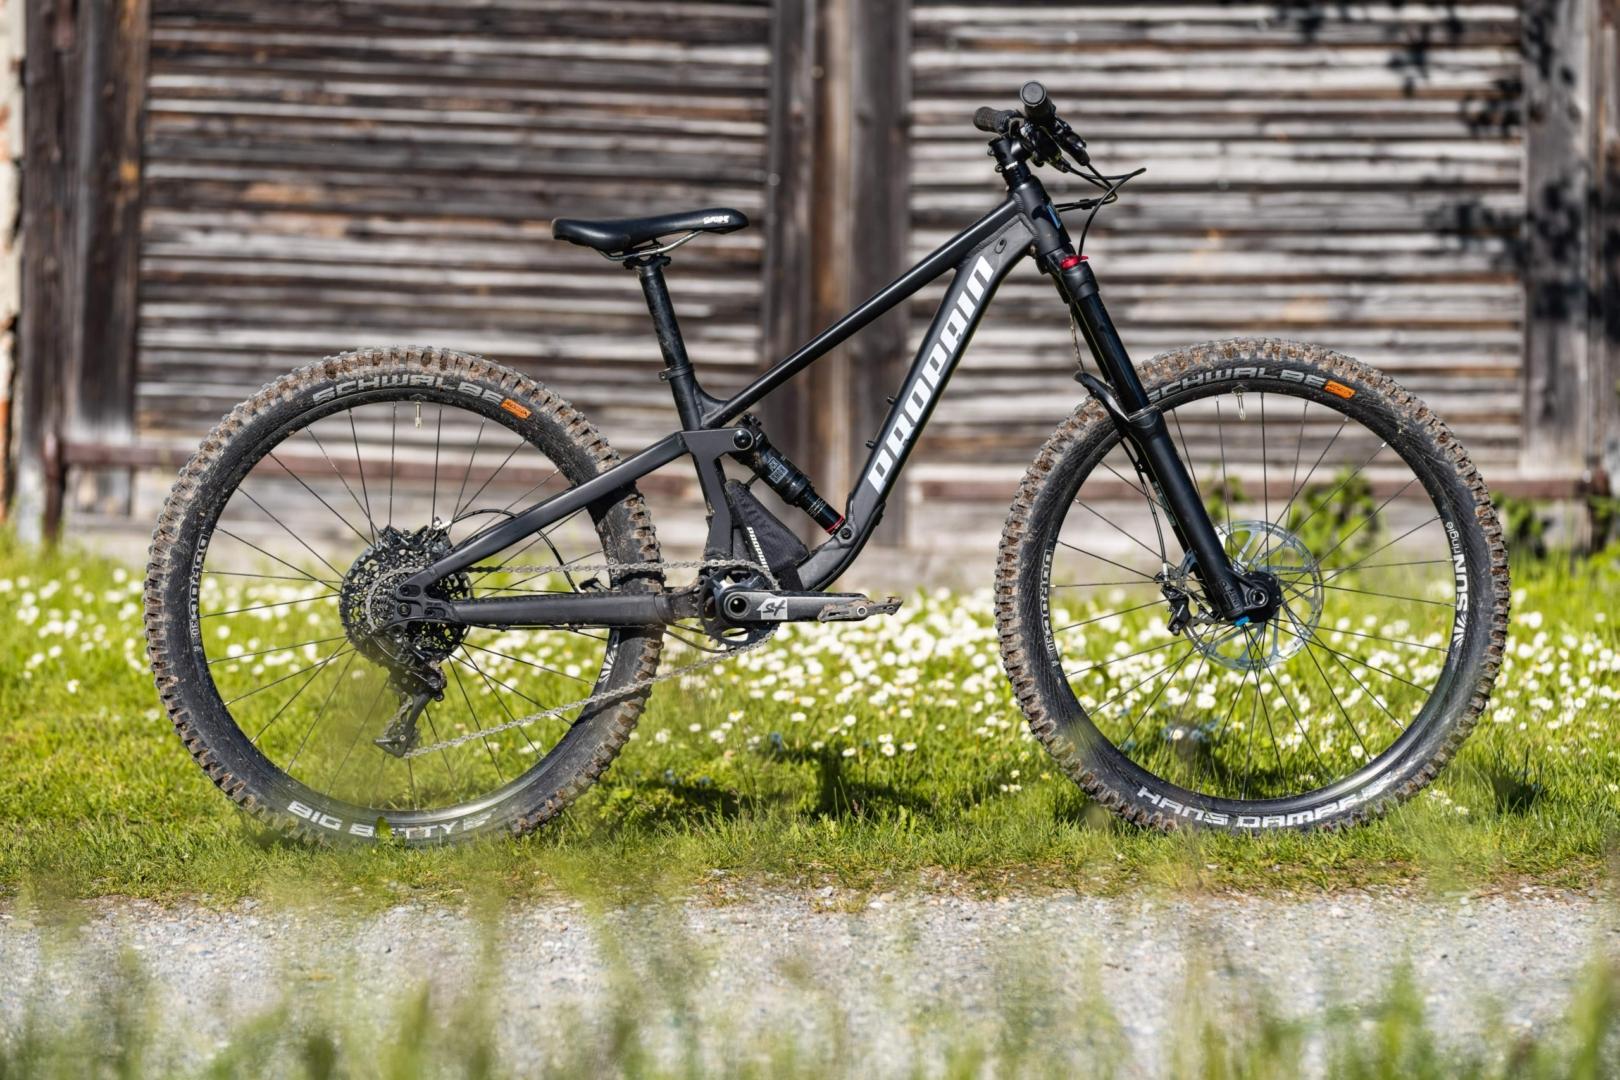 PROPAIN-Yuma-MY21-Weingarten-Bike-Still-venomblack-Side-scaled.jpg